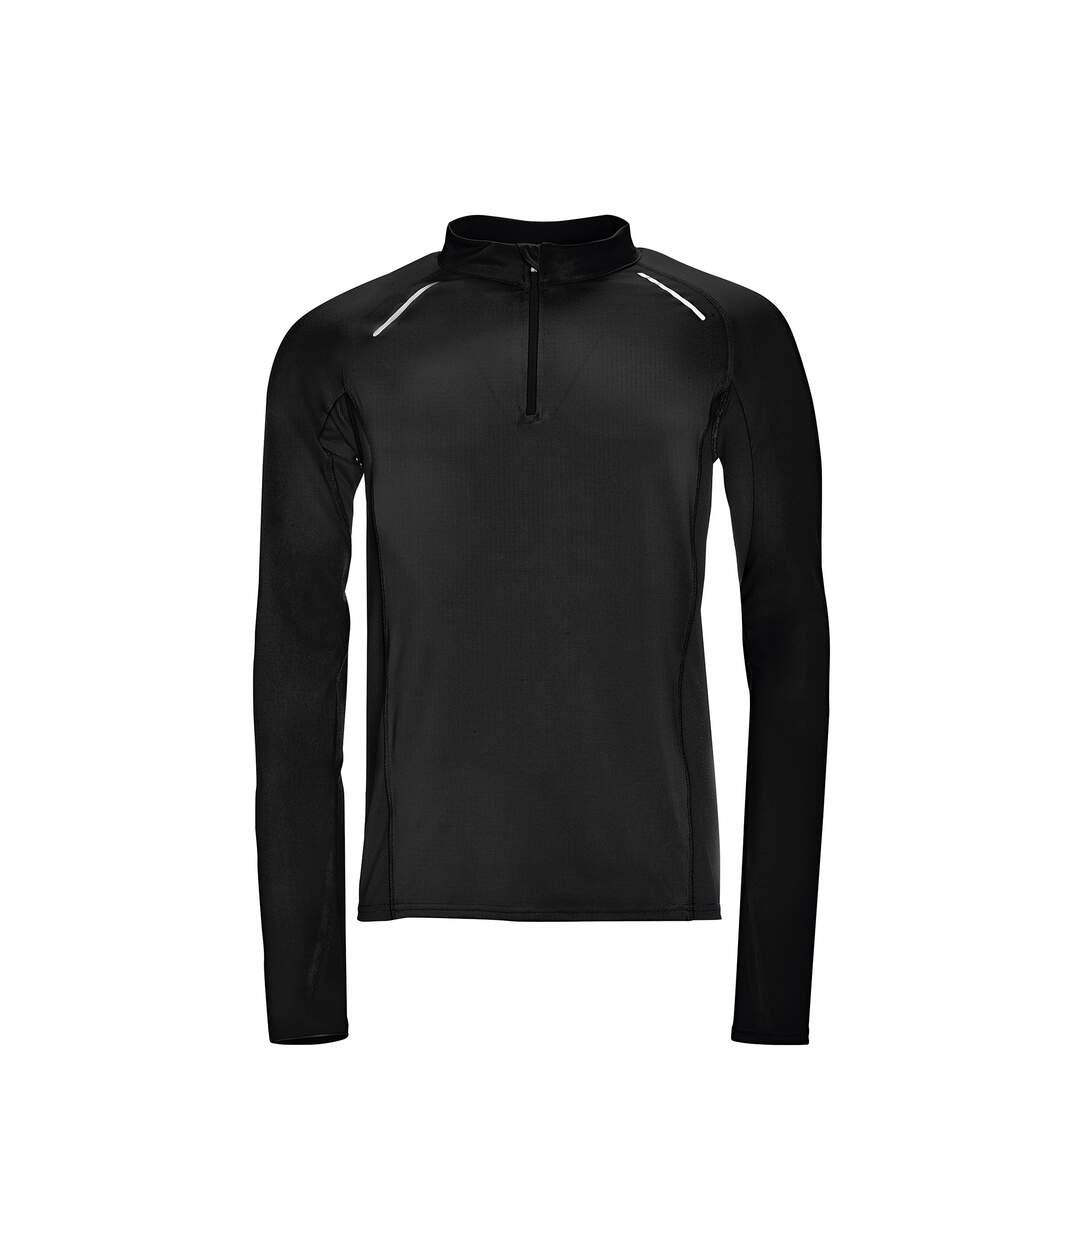 SOLS Mens Berling Long Sleeve Zip Neck Sports Top (Black) - UTPC2602